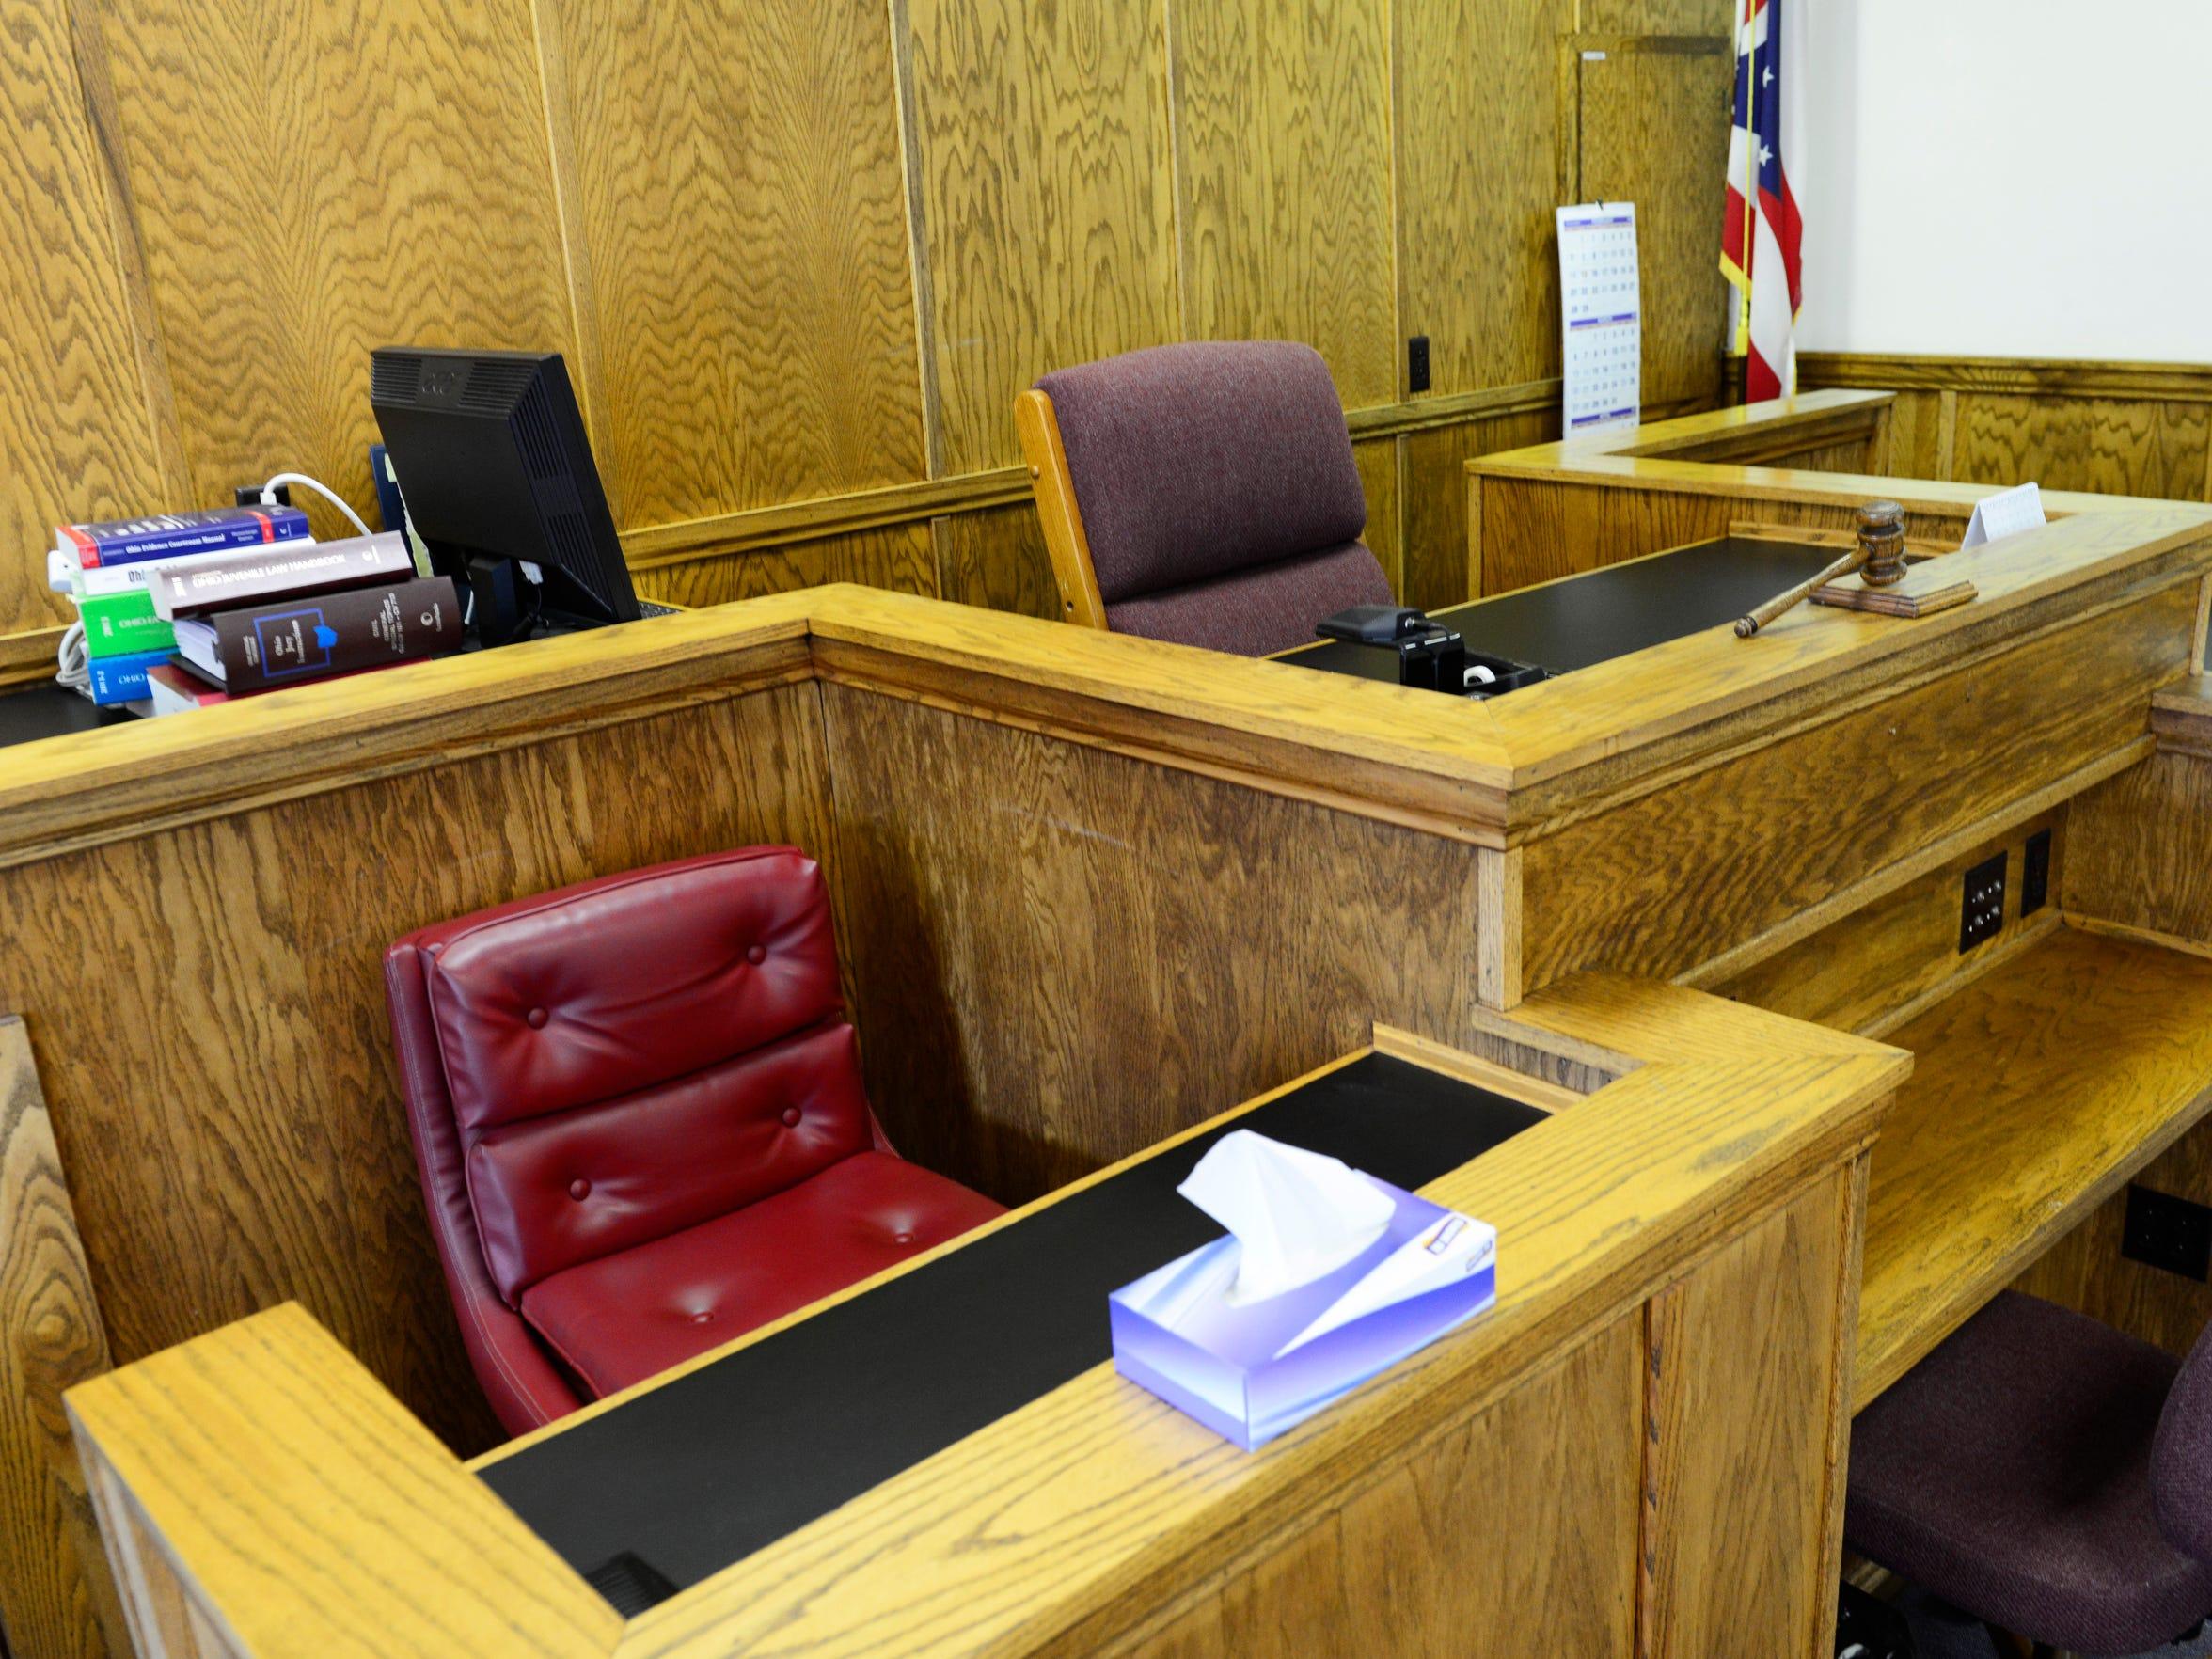 The number of permanent child custody hearings in Sandusky